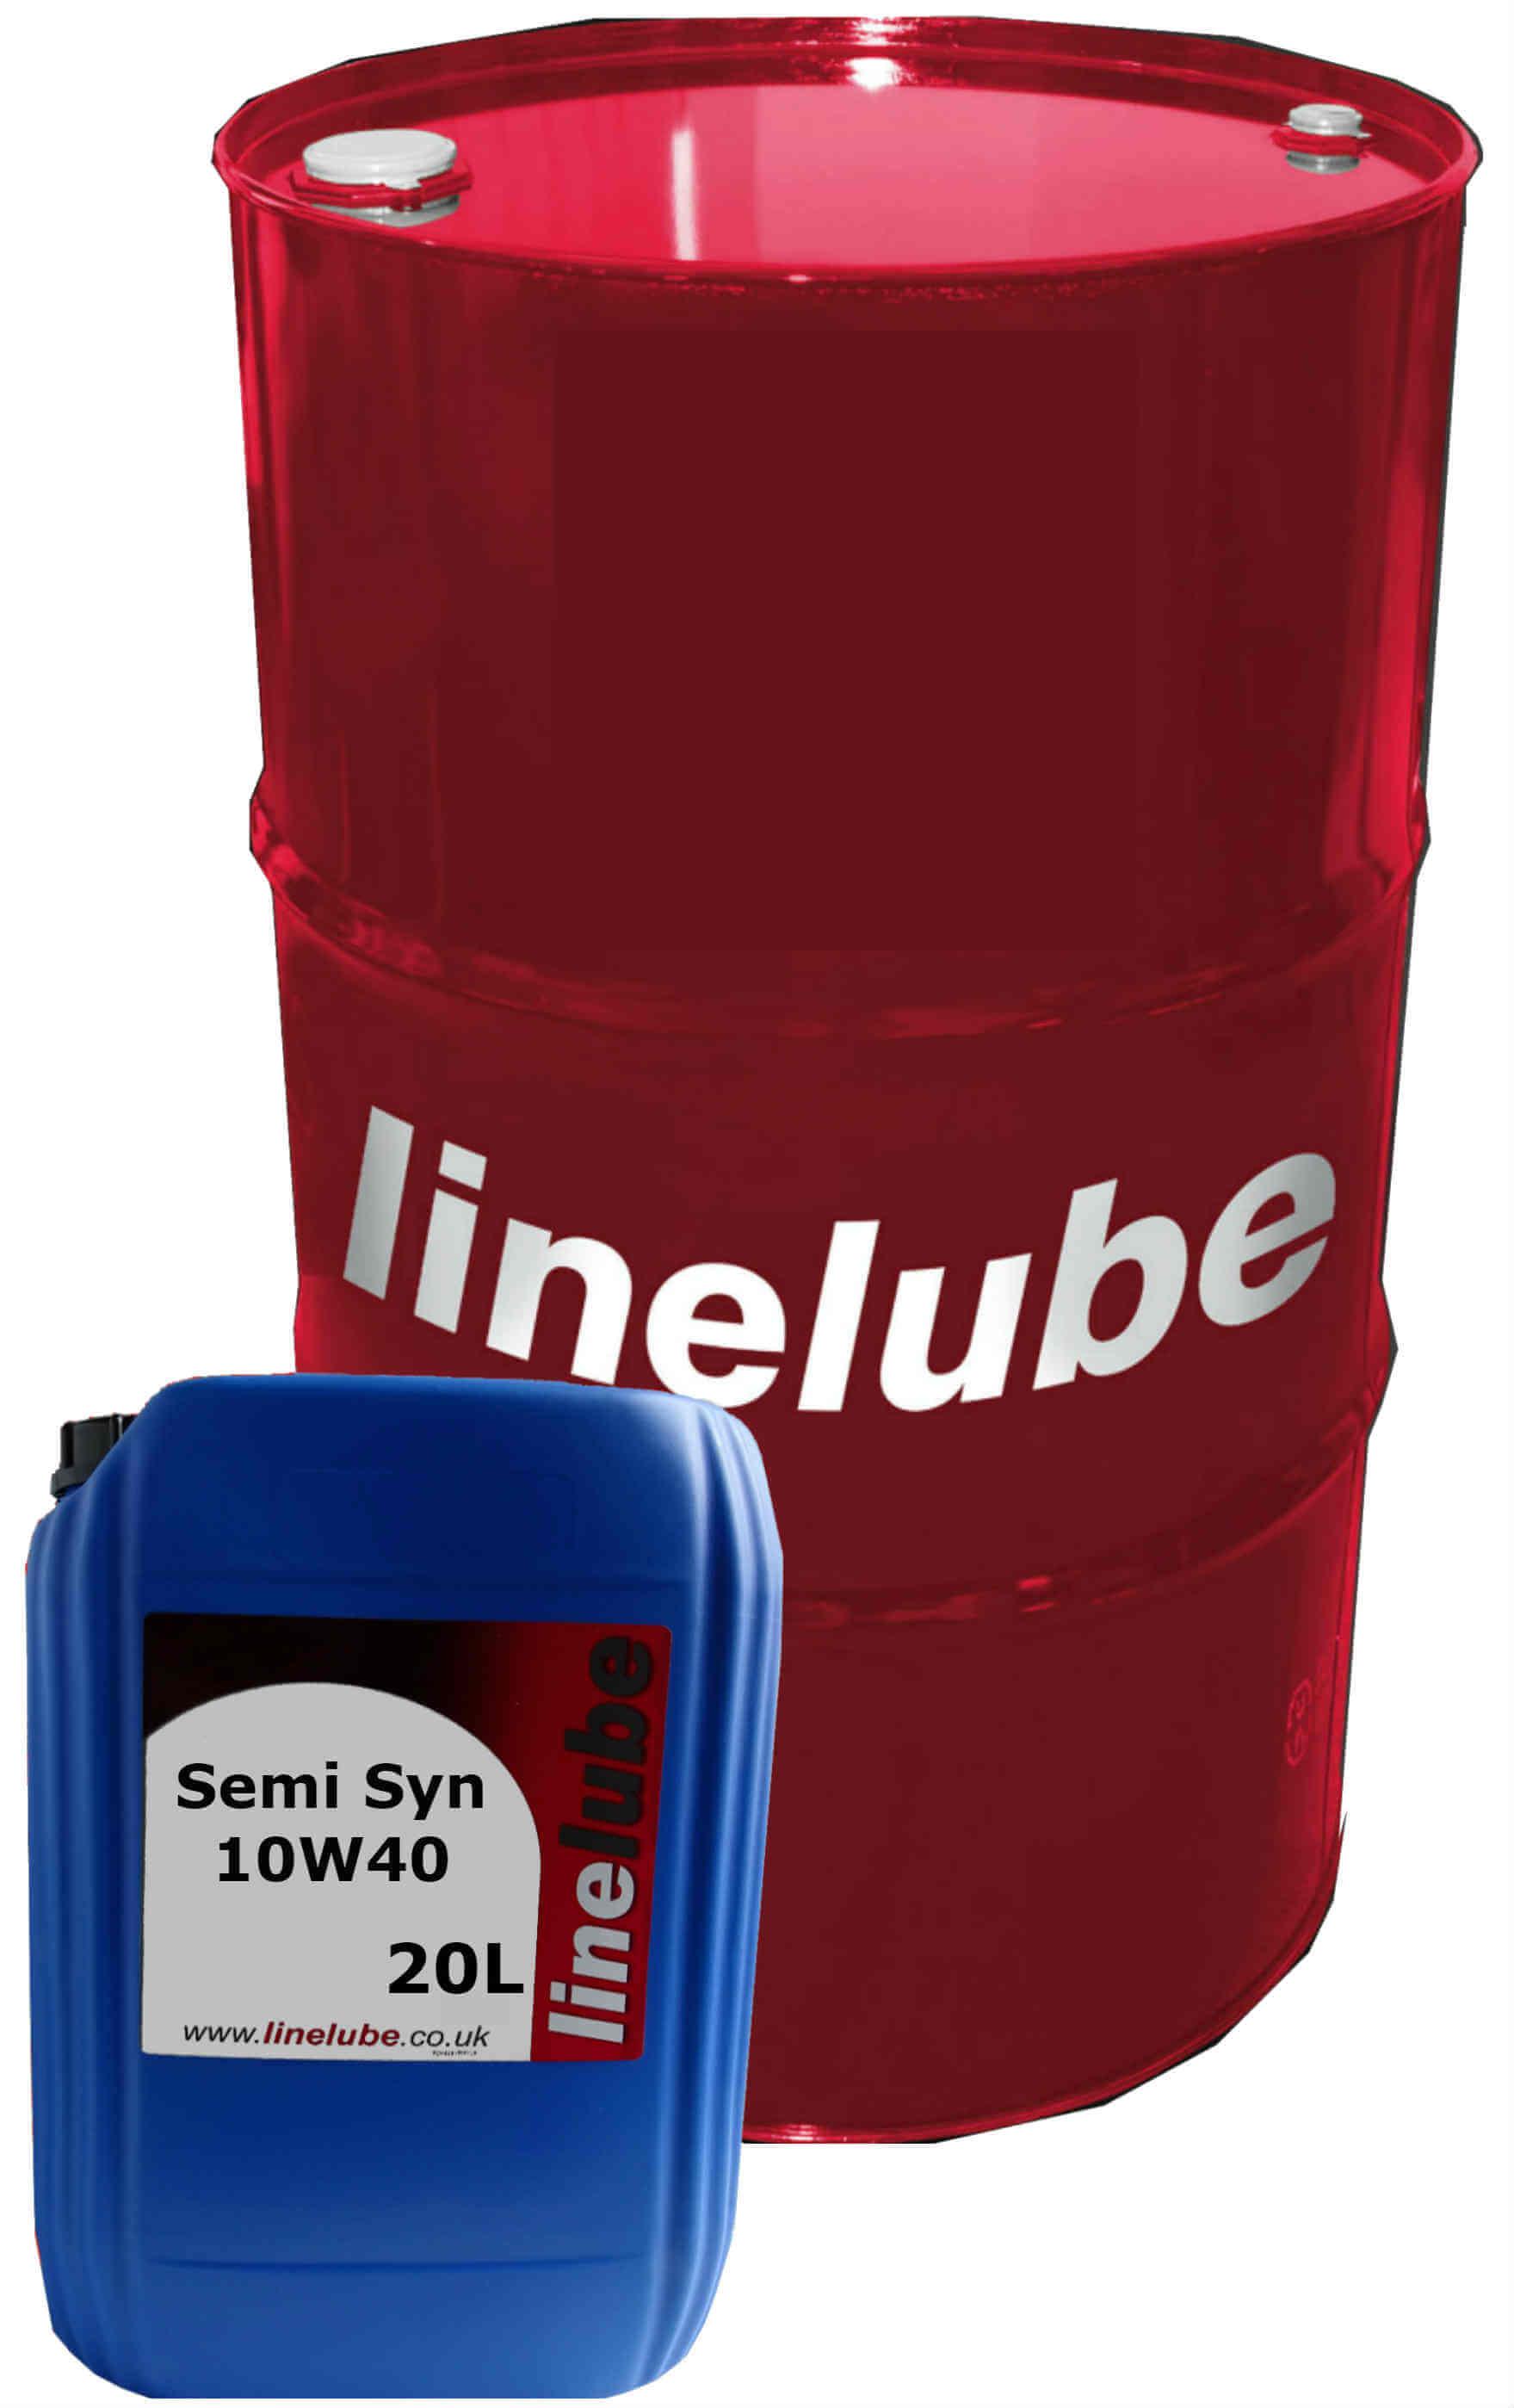 Linelube Semi Syn 10W40